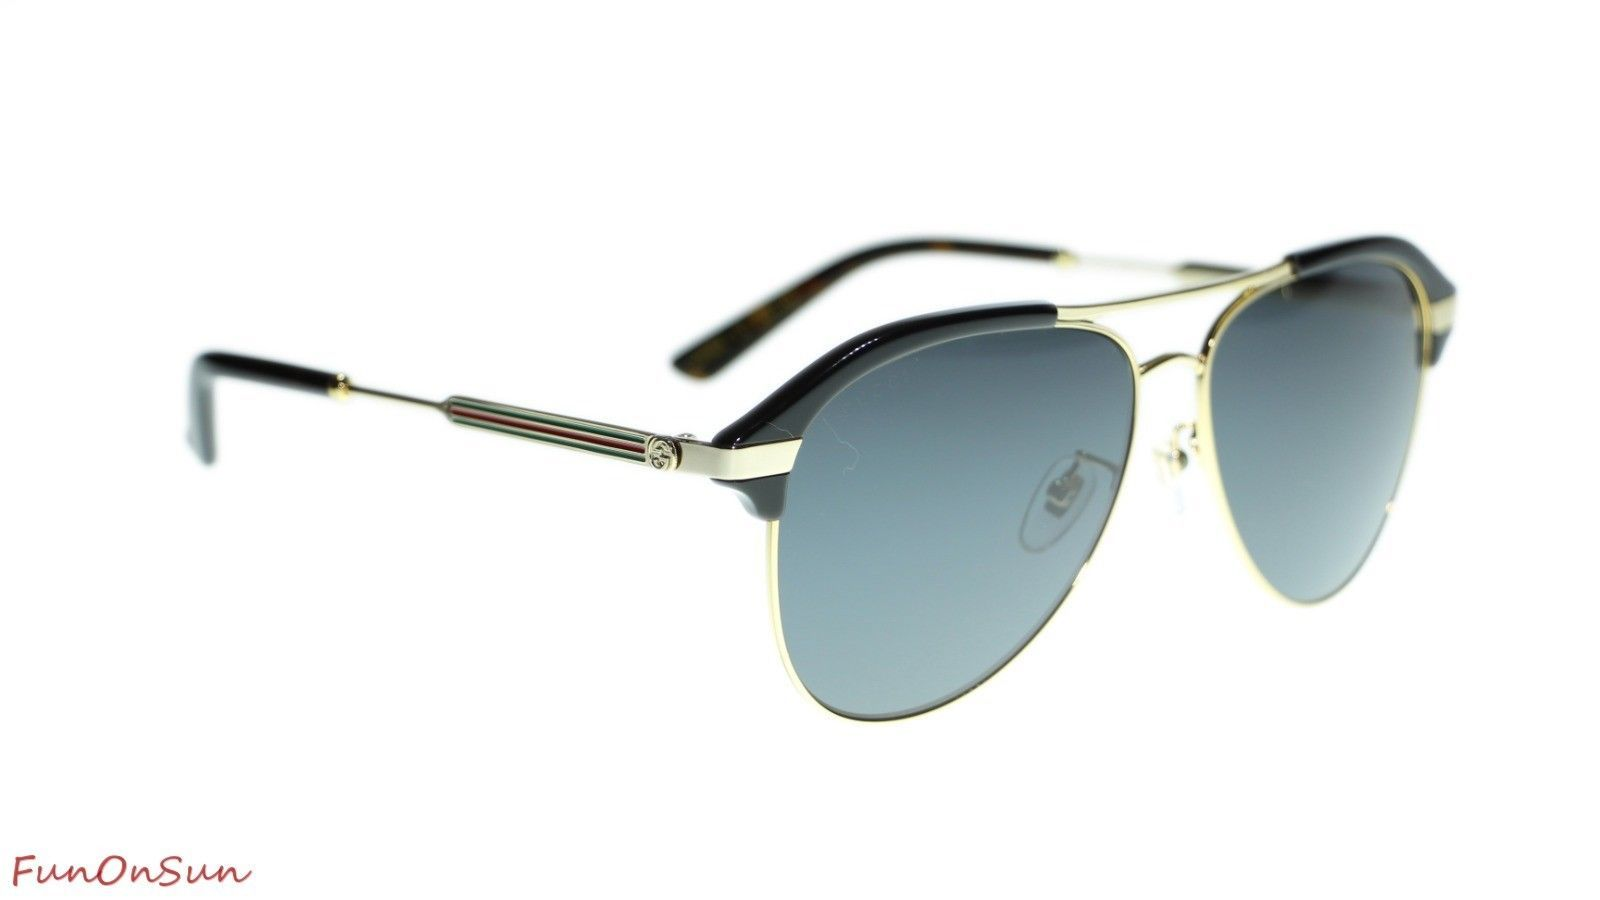 e614ba39cd0 Gucci Men Sunglasses GG0288SA 001 Black Gold Grey Lens Aviator 60mm  Authentic